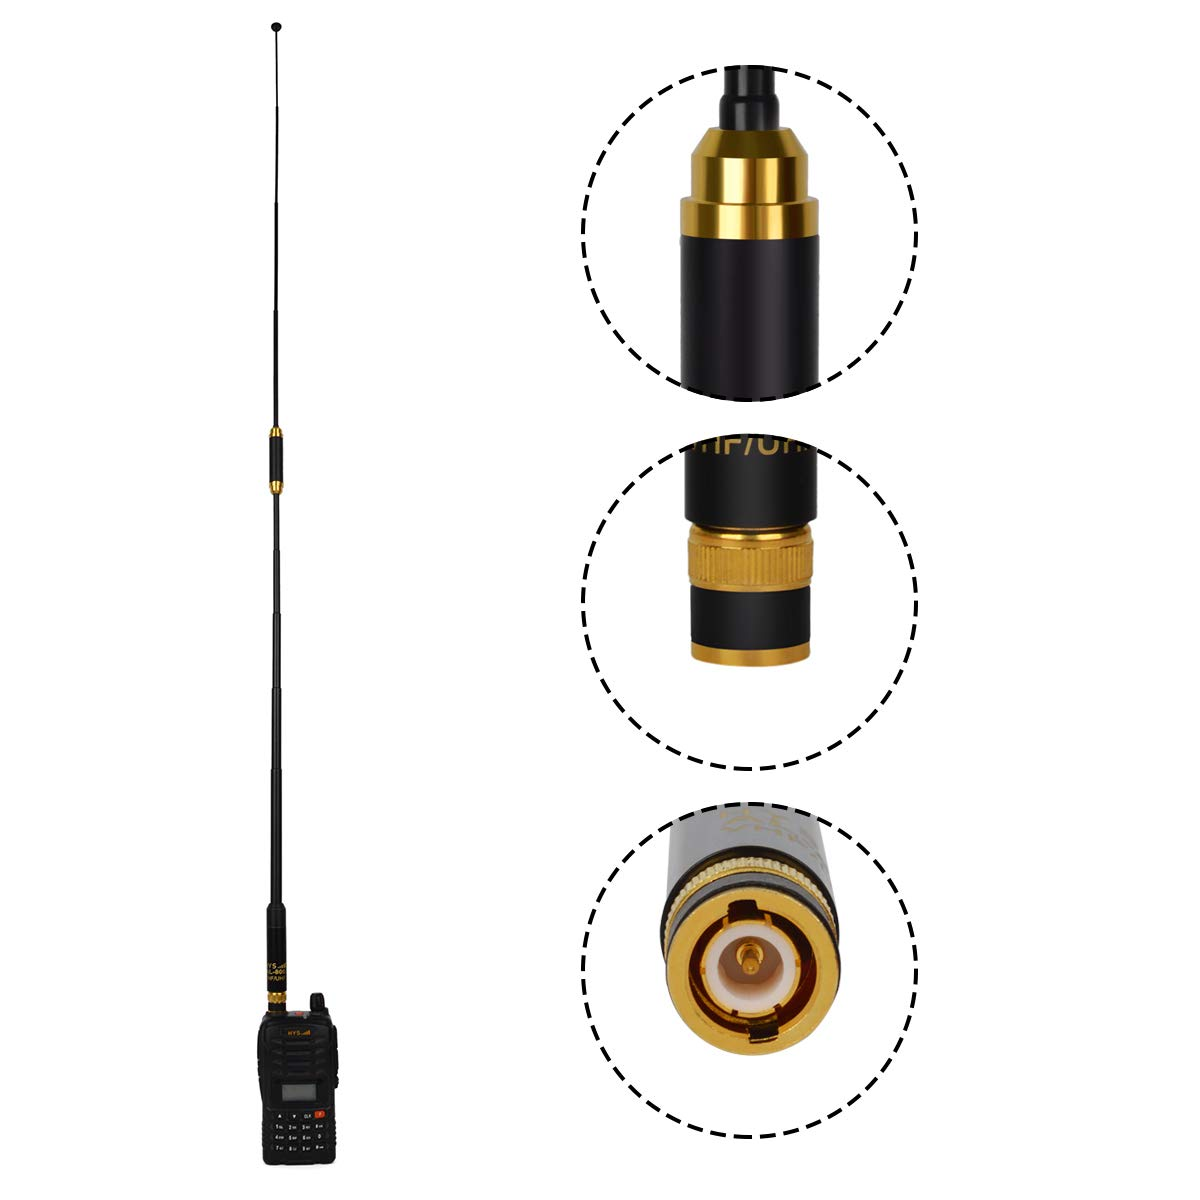 HYS Dual Band BNC Telescopic UHF VHF Two Way Radio 144//430MHz 33.5inch Antenna for Kenwood Icom Vertex Standard Walkie Talkies